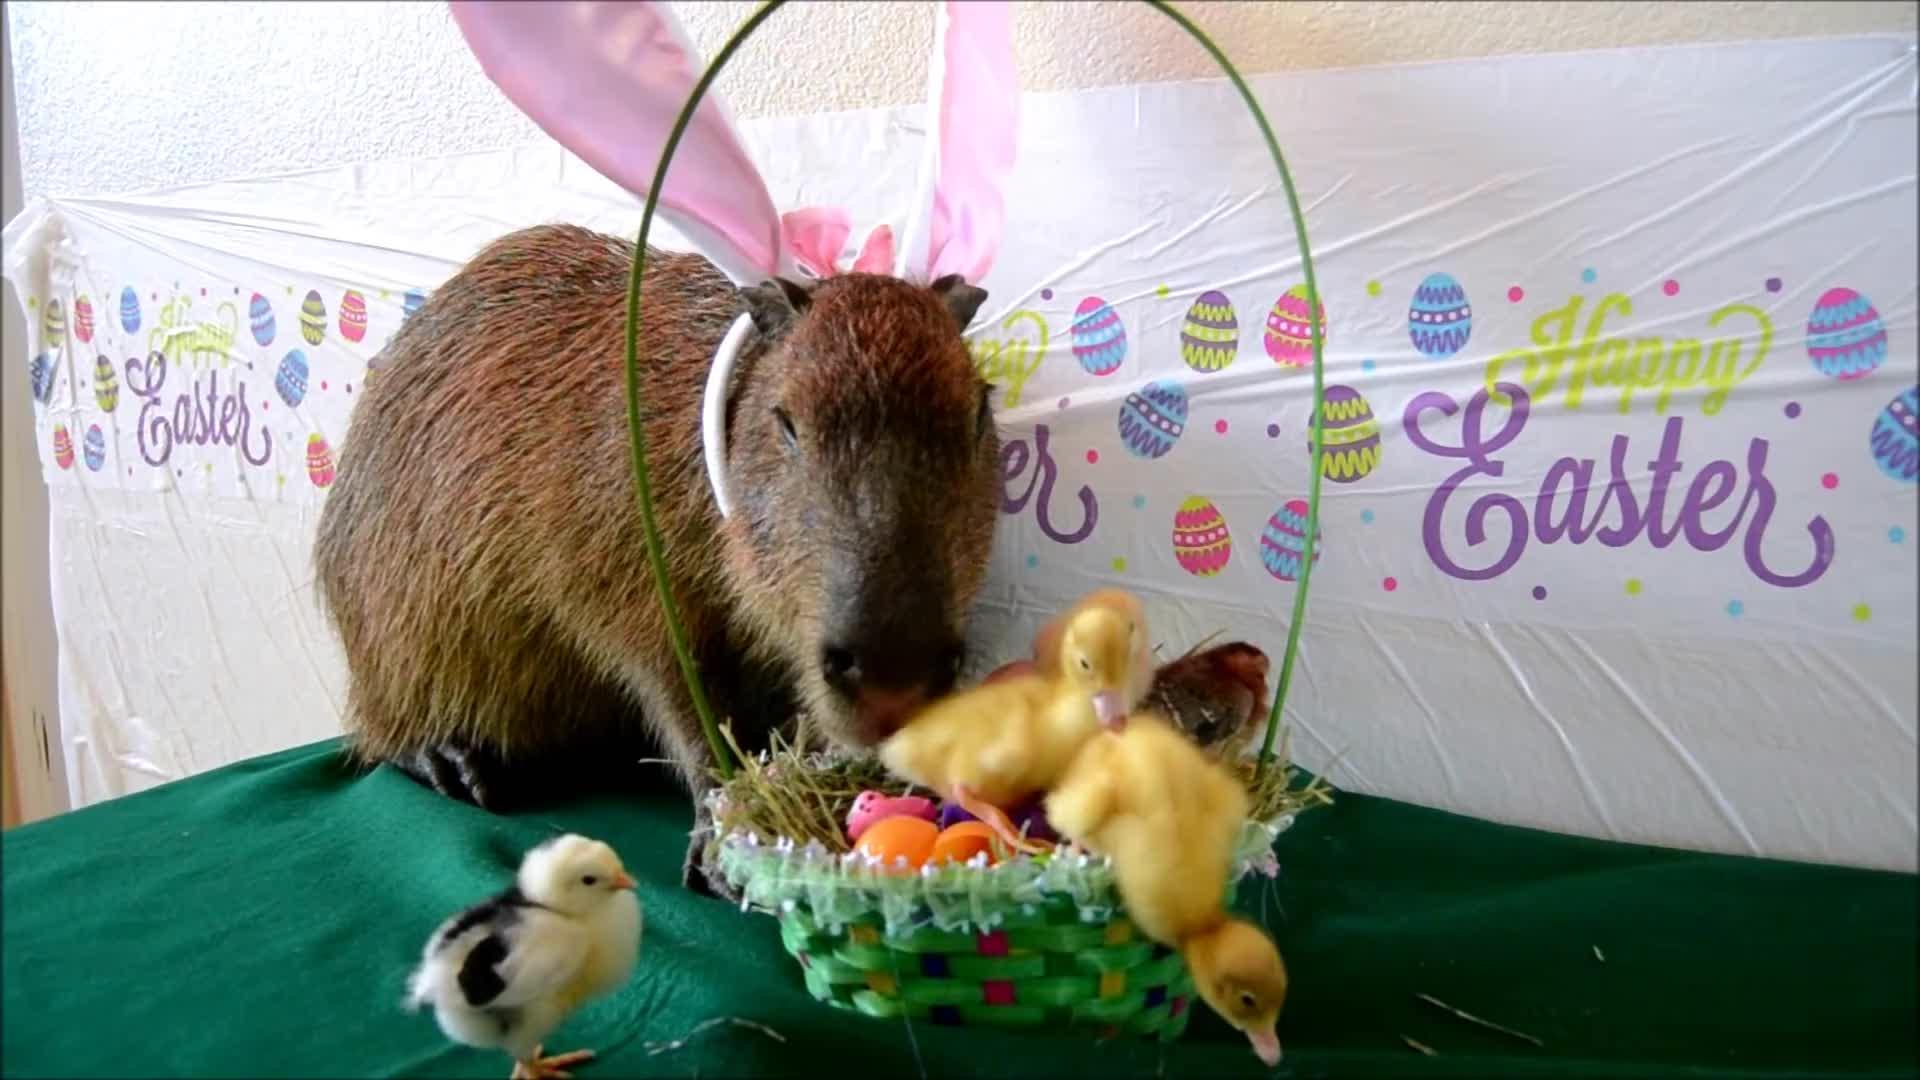 animals, awesome, capybara, crazy cody's creatures, ducks, joejoe the capybara, pets & animals, Cappy Easter GIFs